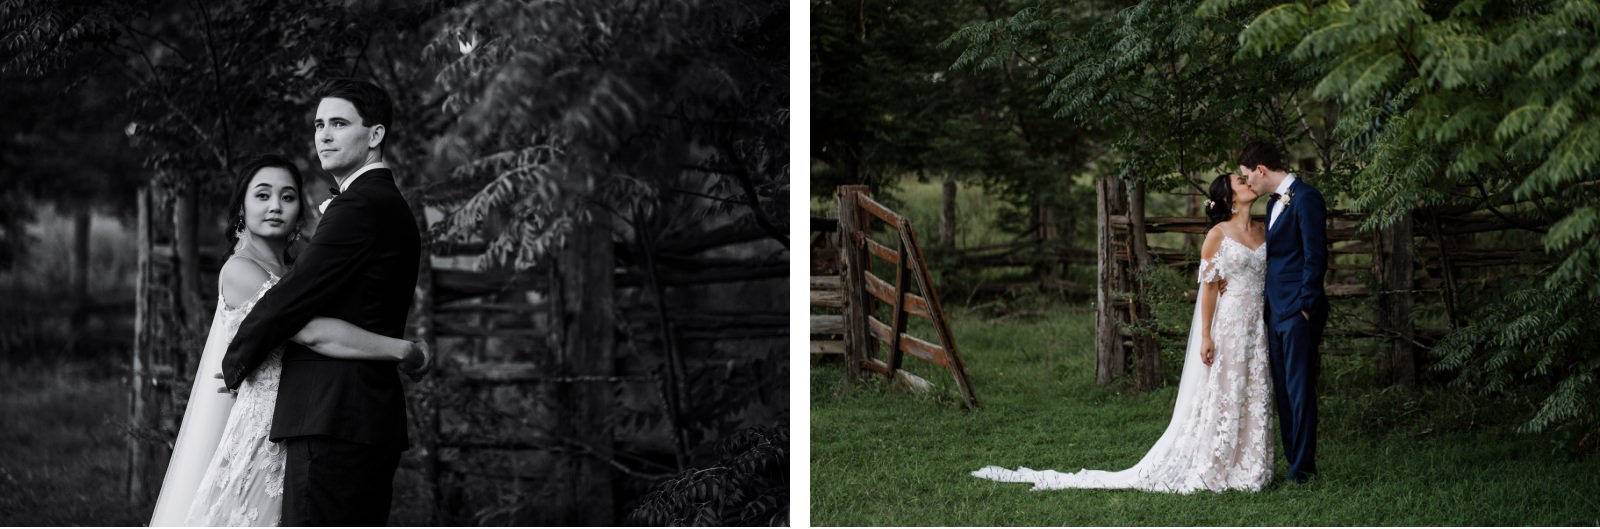 wollombi-wedding-photography-hunter-valley-wedding-photographers-70